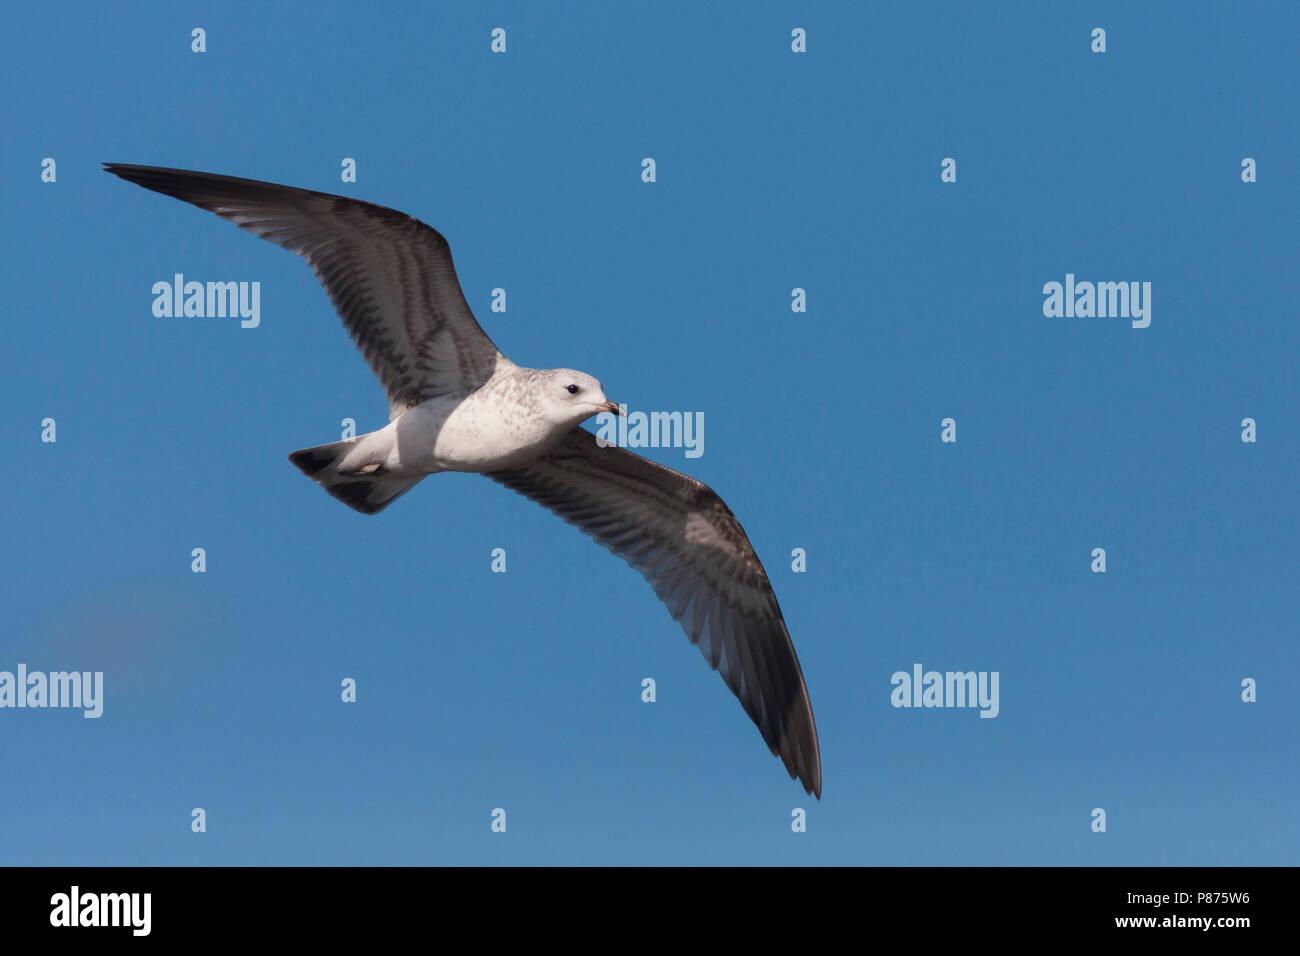 Common Gull - Sturmmöwe - Larus canus ssp. canus, Germany, 1st cy - Stock Image